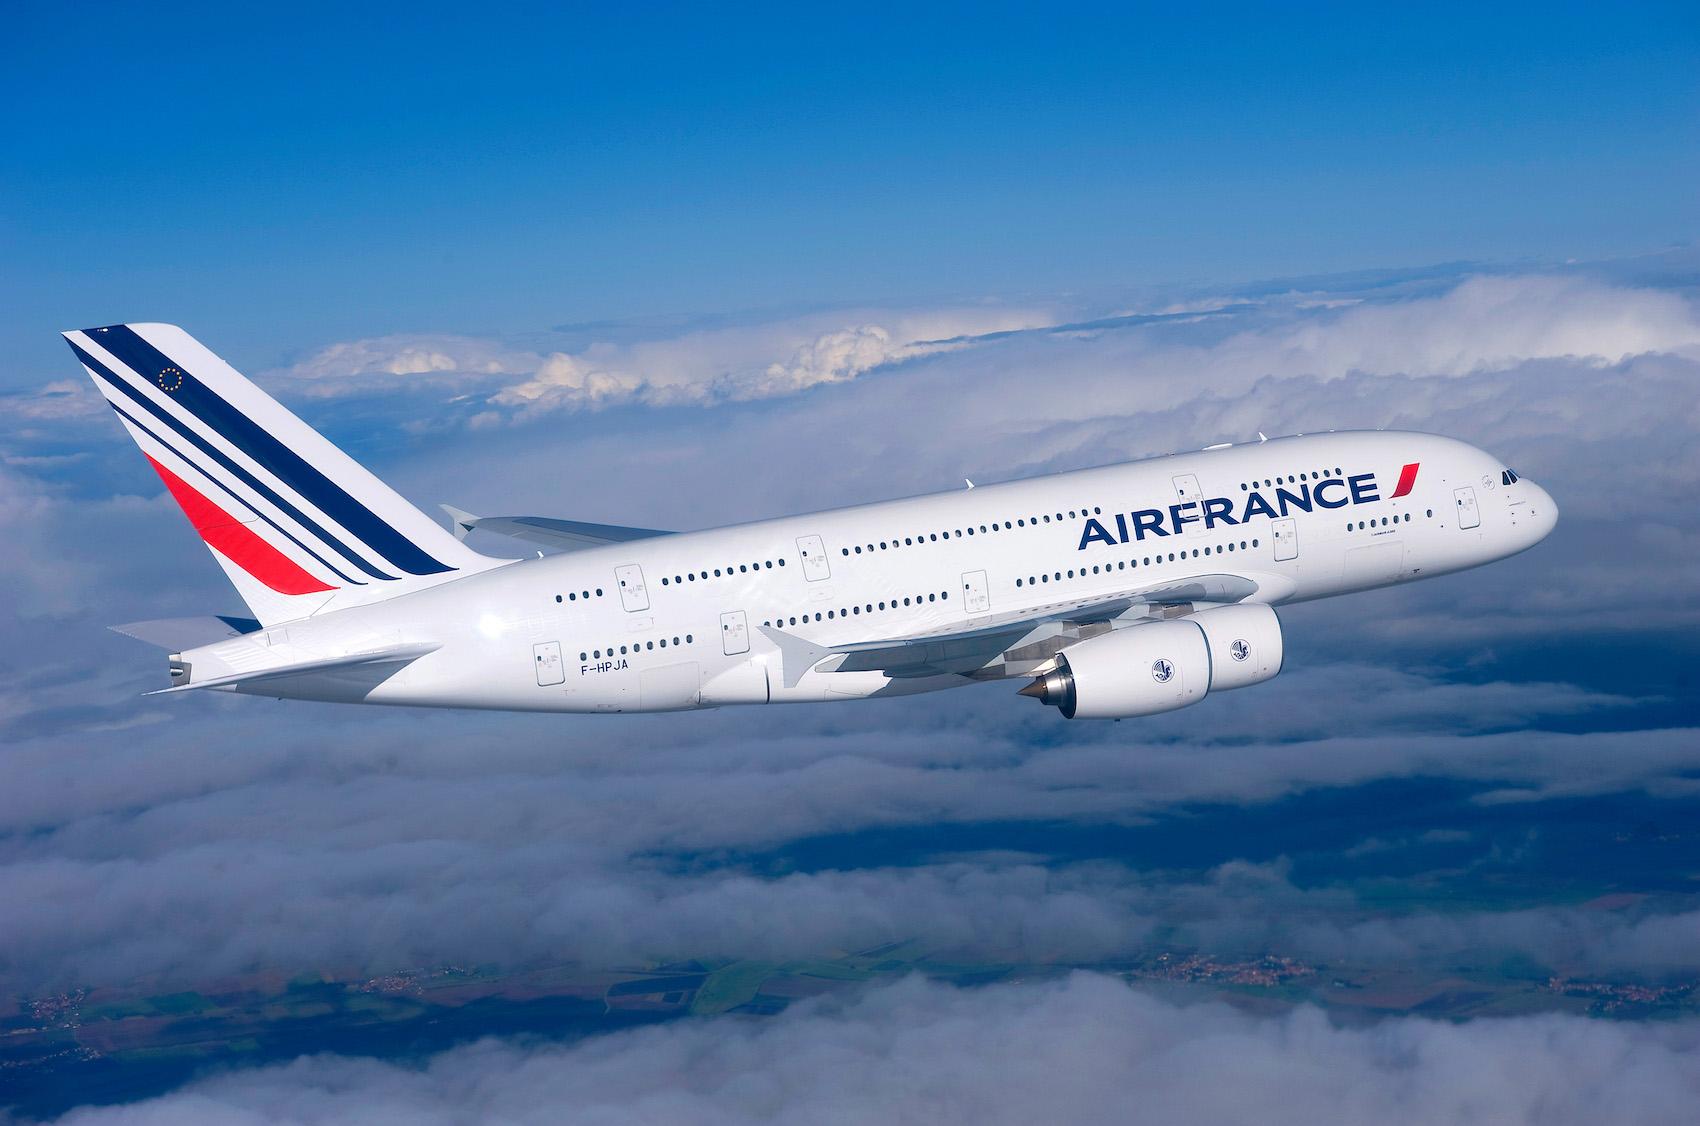 Air France fliegt mit Biokerosin ab